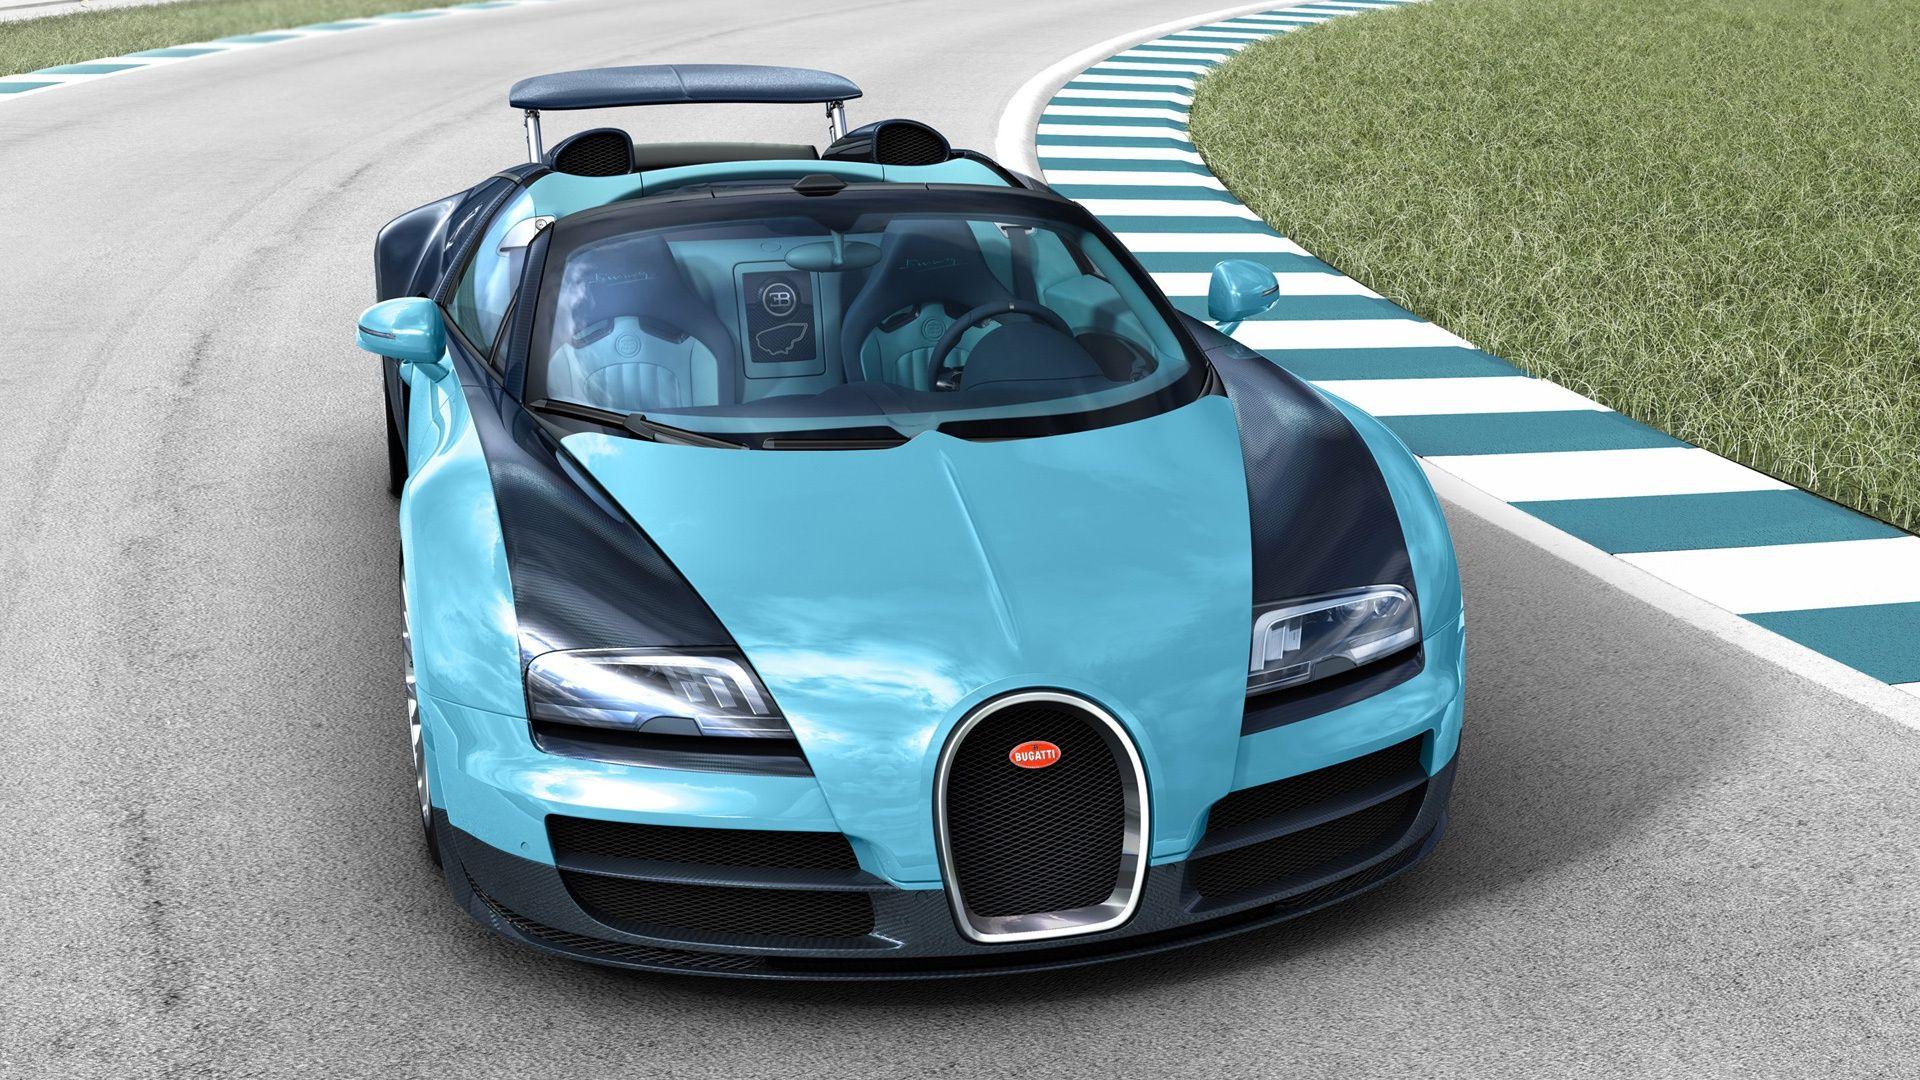 bugatti_veyron_wallpaper_hd_025 Fascinating Bugatti Veyron Price south African Rands Cars Trend